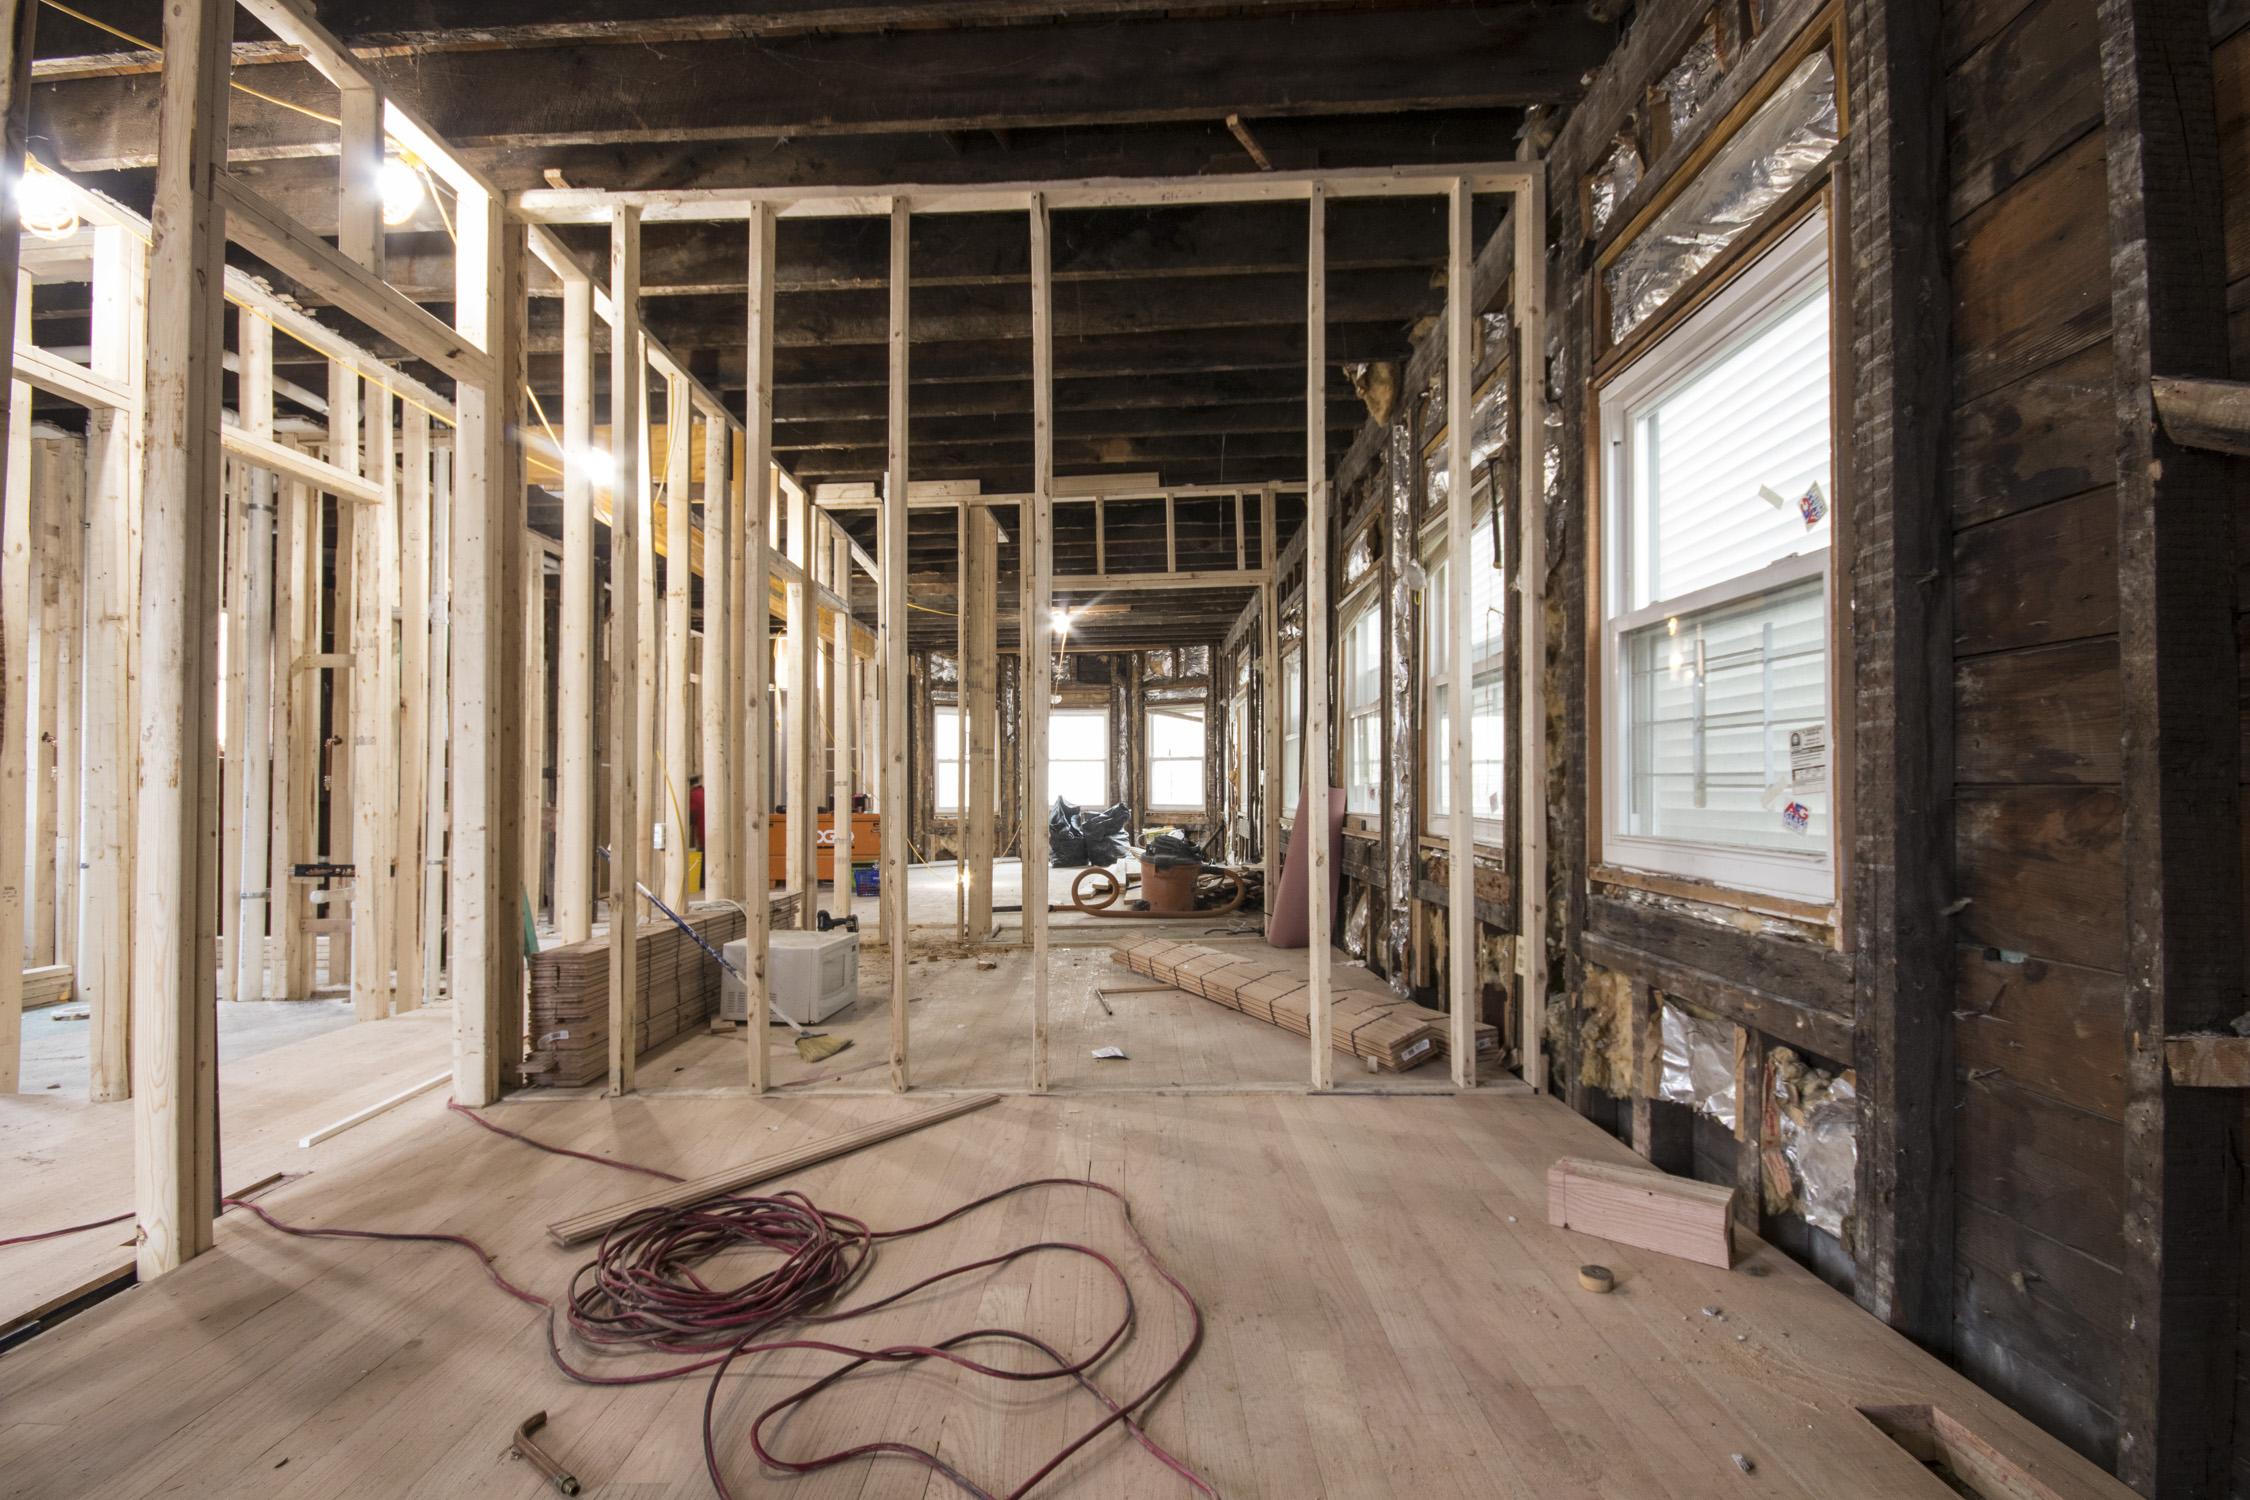 25 darling street homer enovation boston general contractors_33